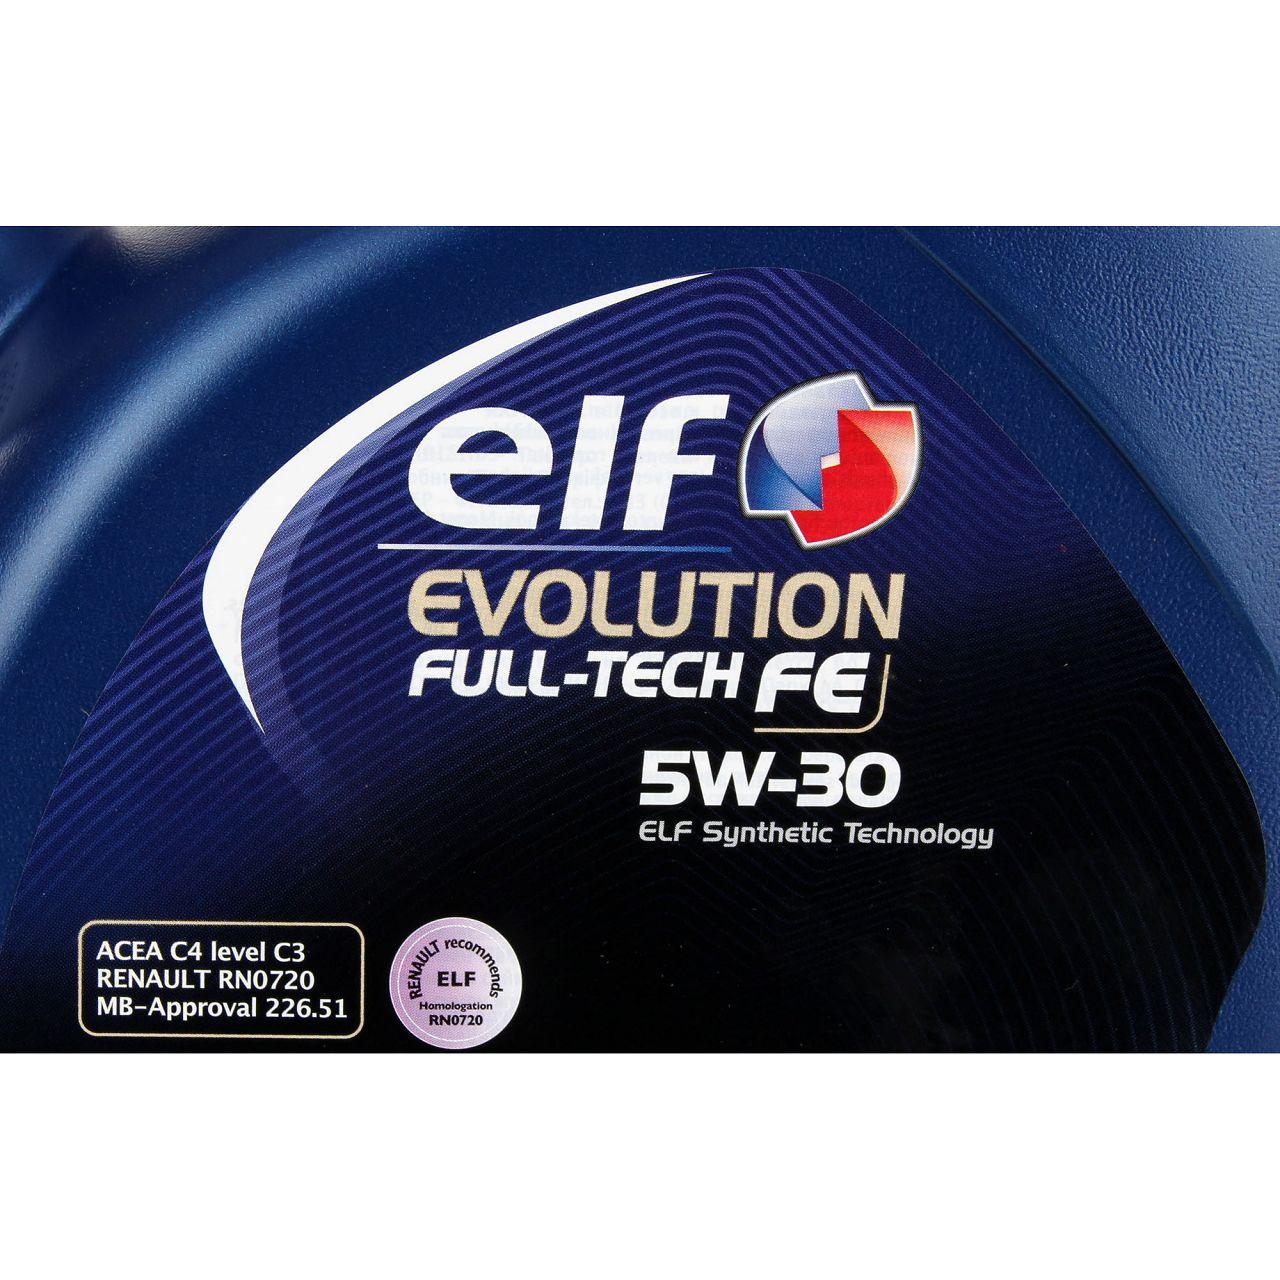 elf Evolution Full-Tech FE 5W-30 Motoröl RENAULT RN0720 MB 226.51 - 5L 5 Liter